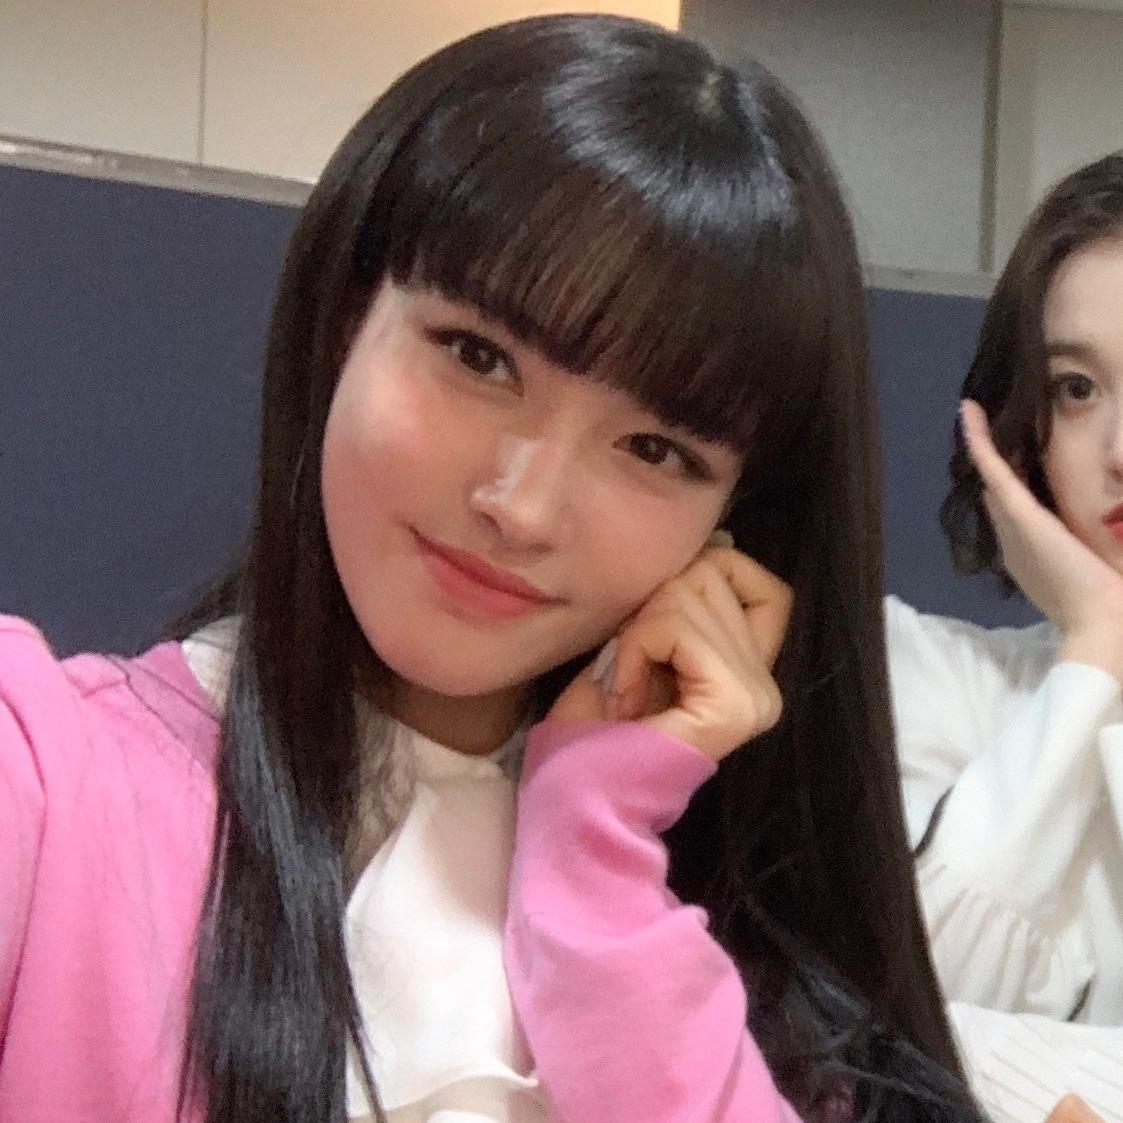 kpop, yoon, and stayc image